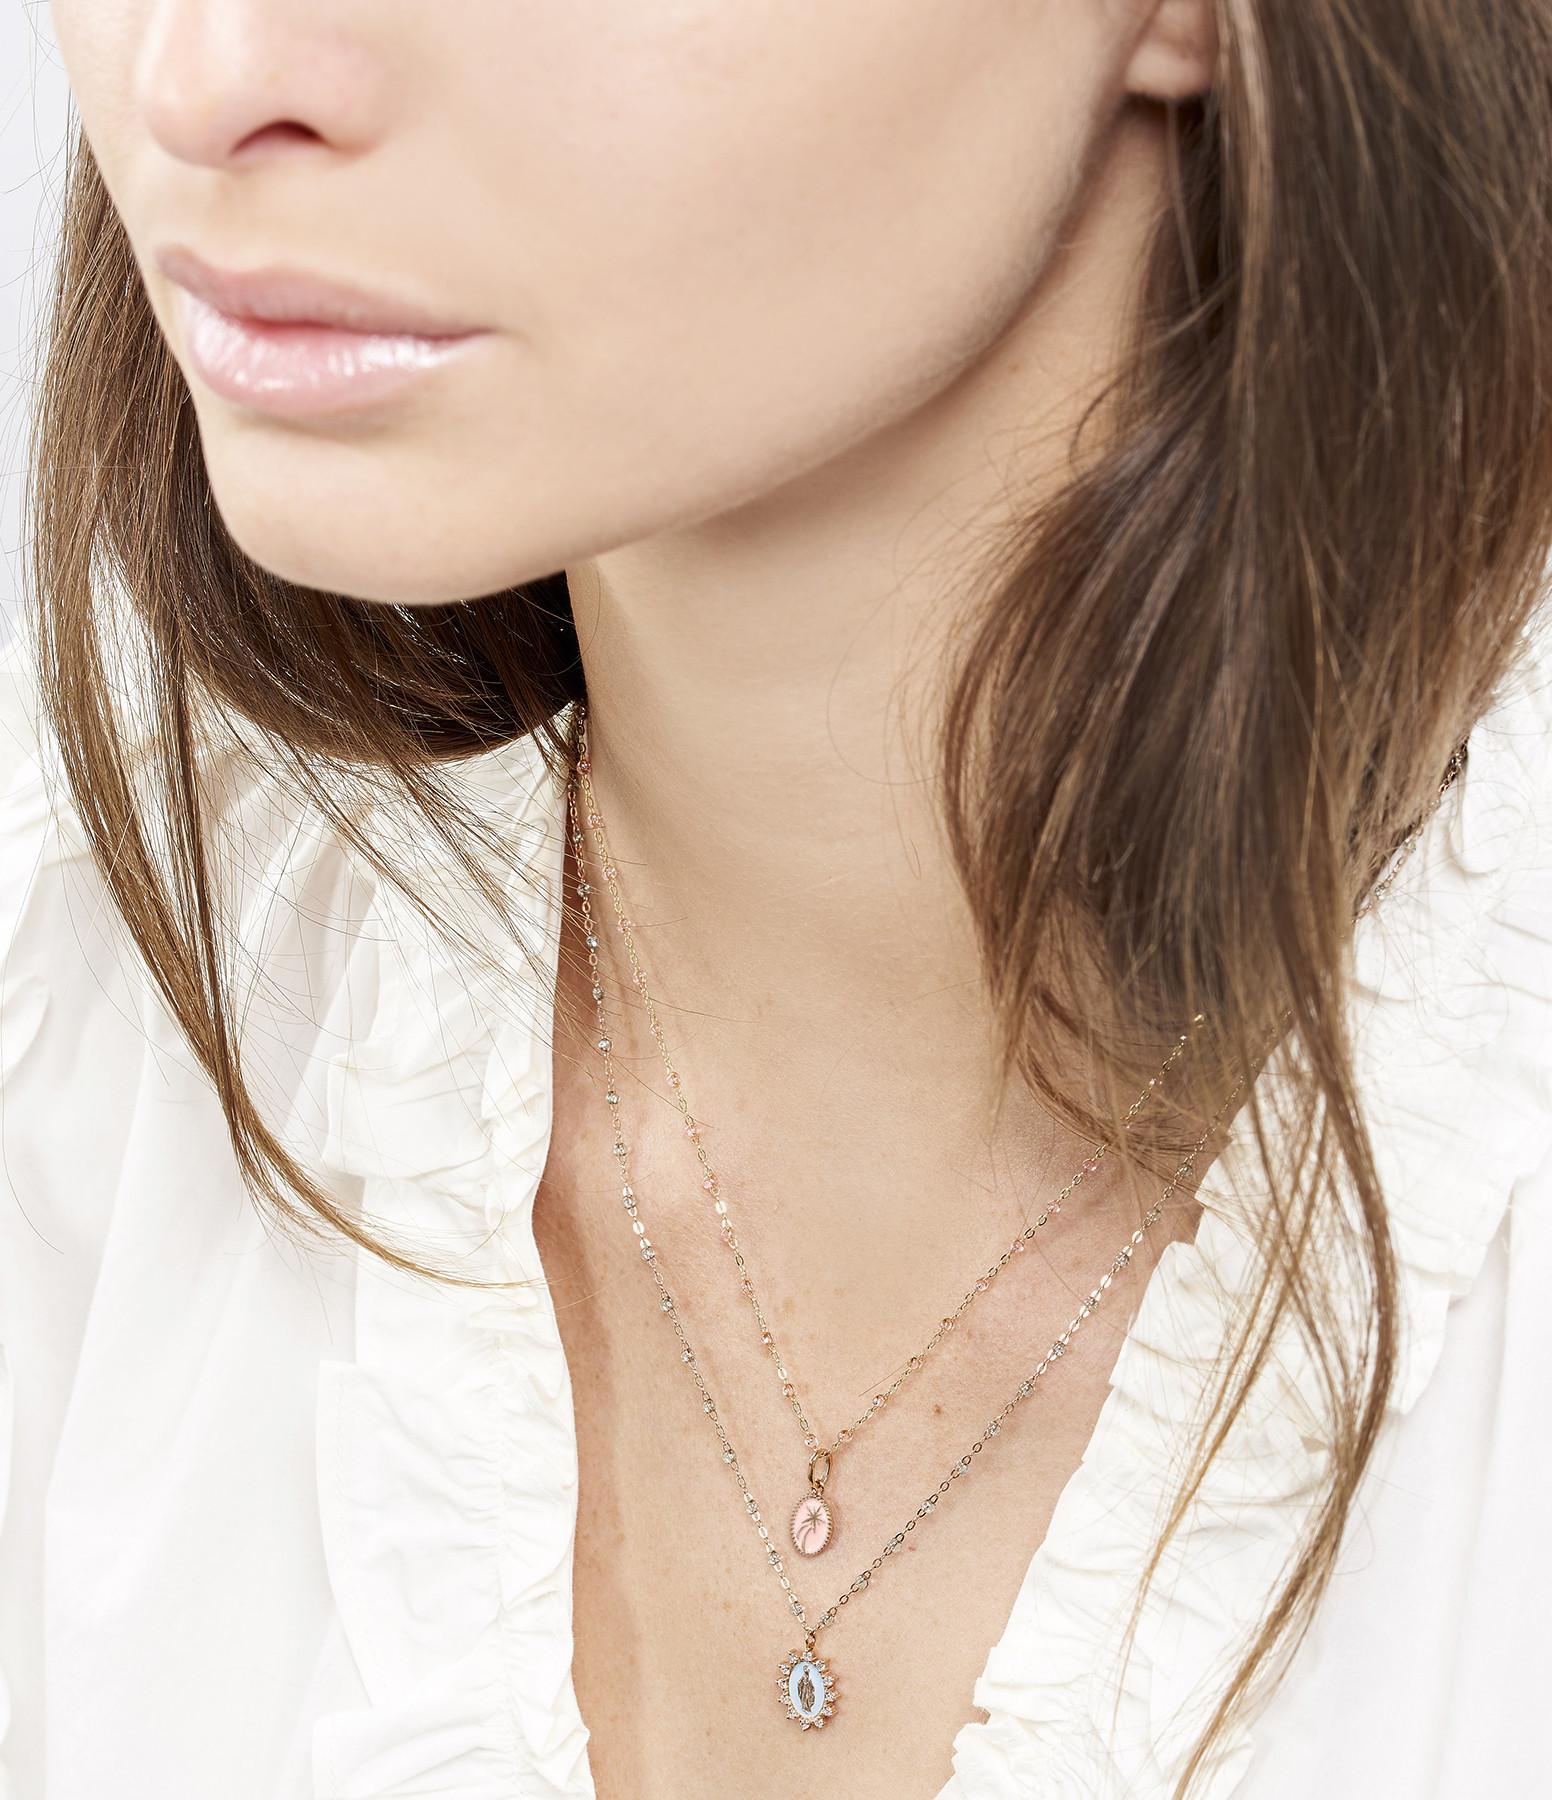 GIGI CLOZEAU - Pendentif Petite Madone Suprême Or Diamants